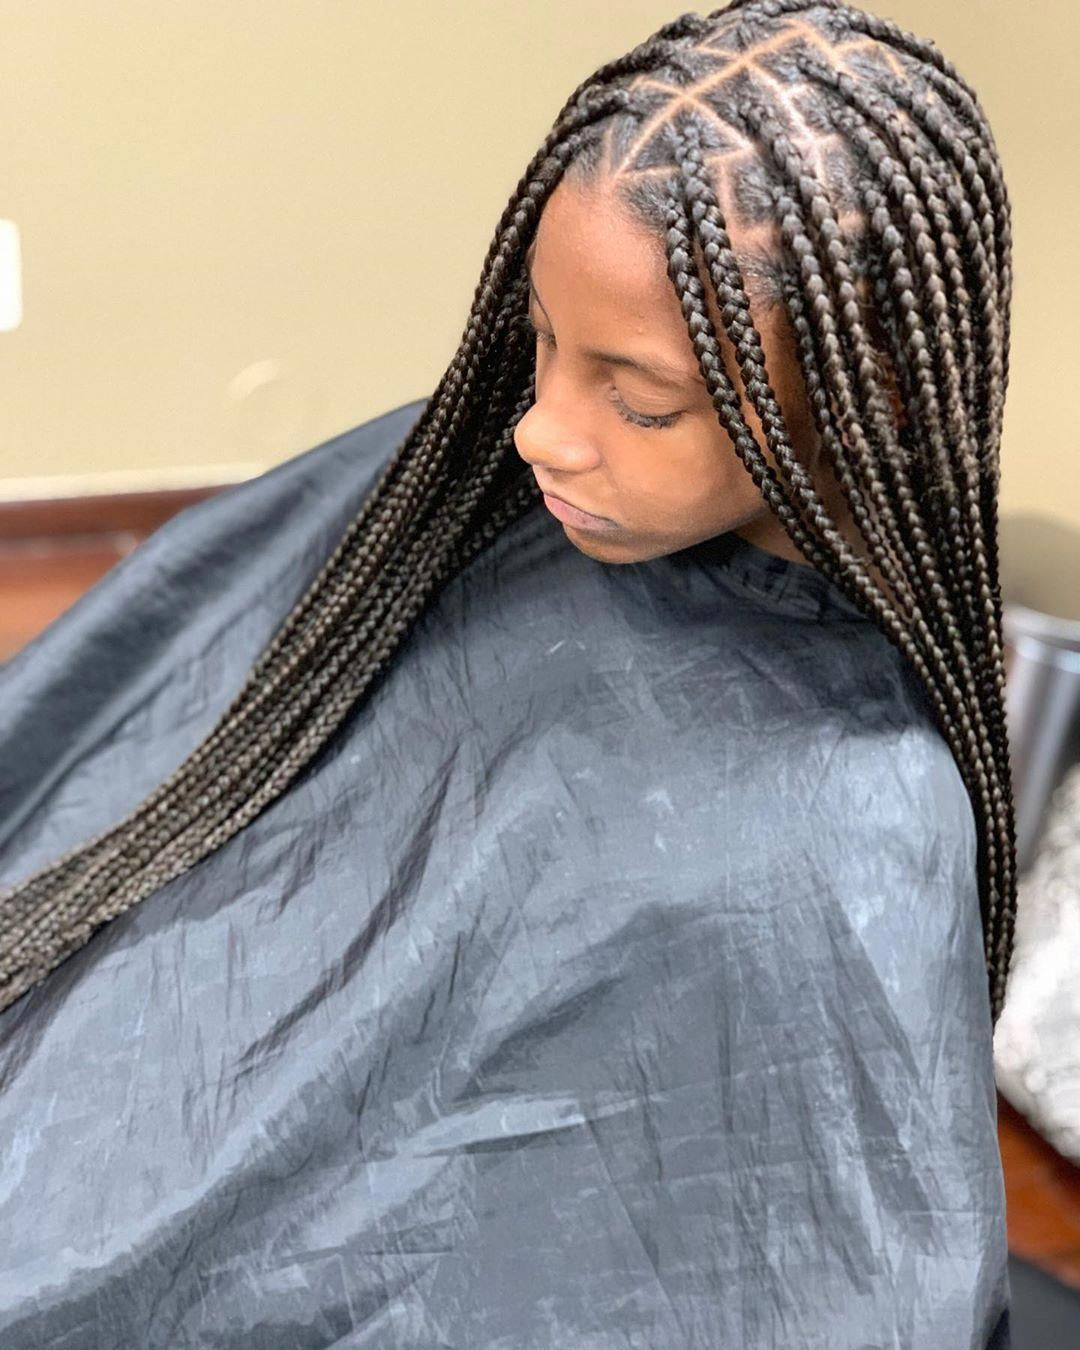 70 Braided Hairstyles For Winter 2018 Box Braids